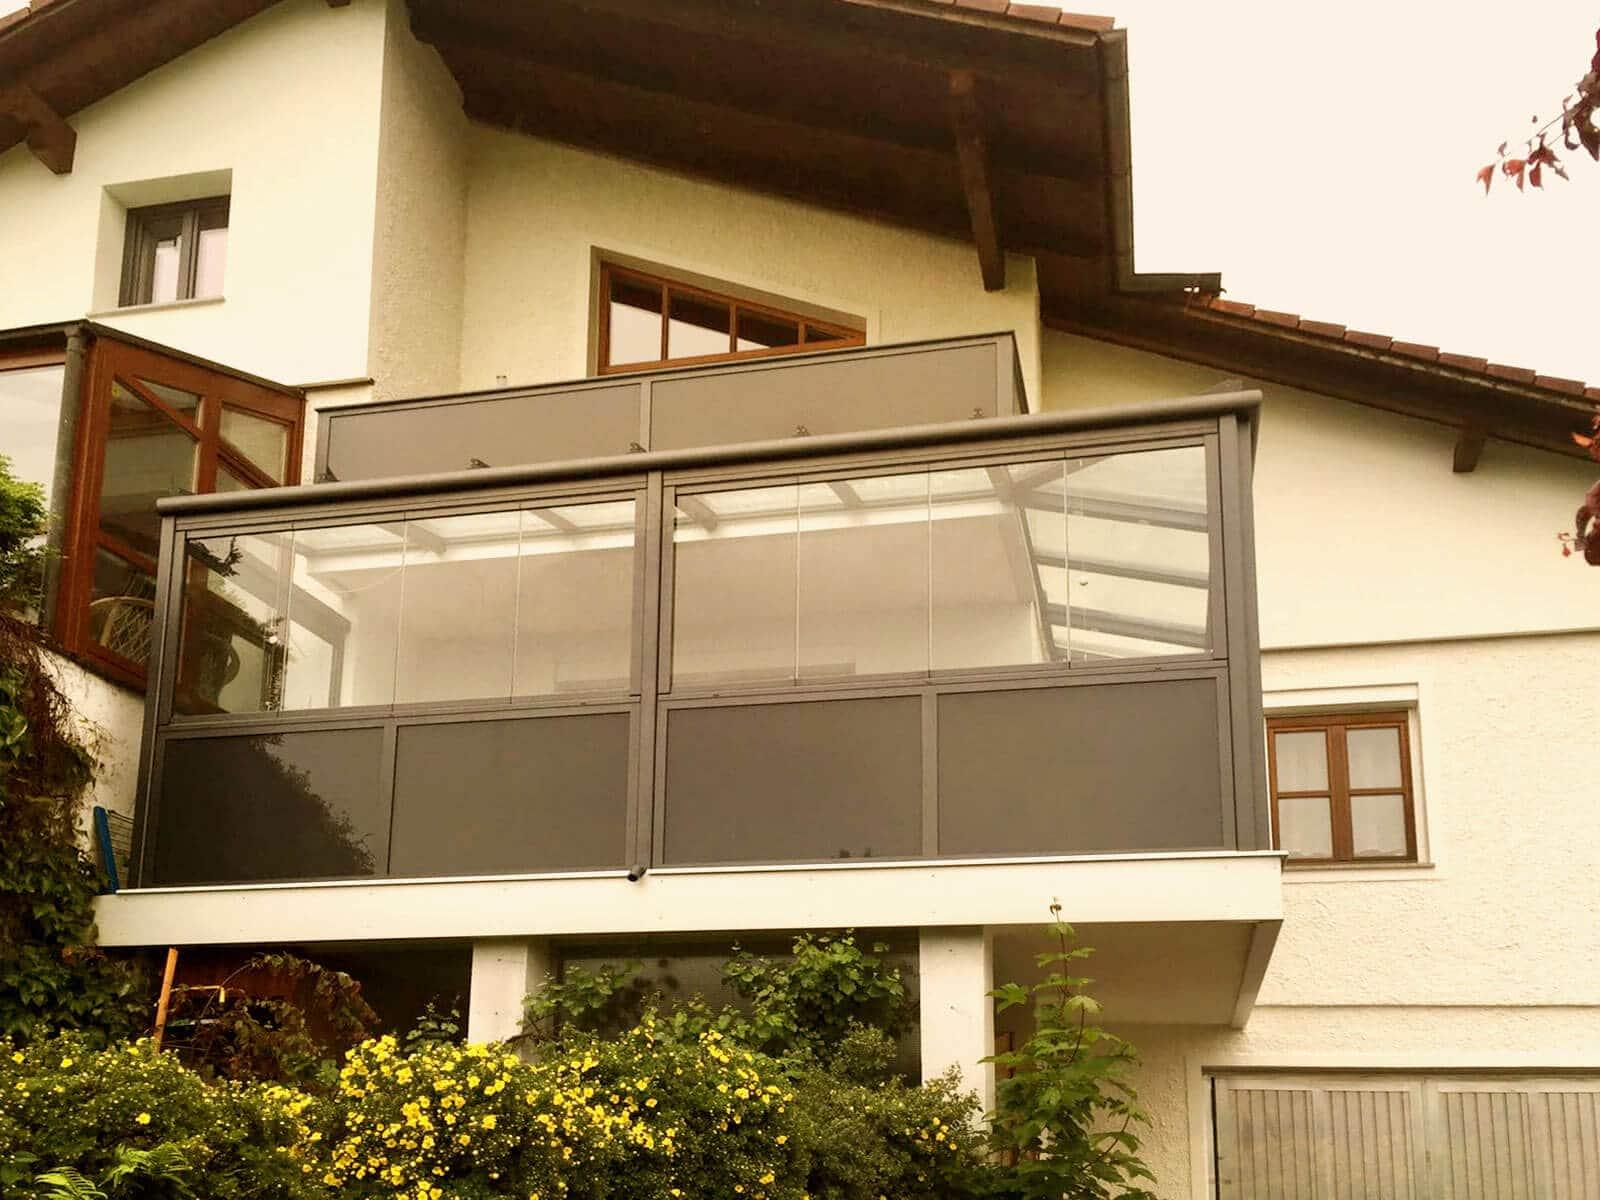 schiebet ren f r holzhaus aus aluminium glas fenster schmidinger. Black Bedroom Furniture Sets. Home Design Ideas